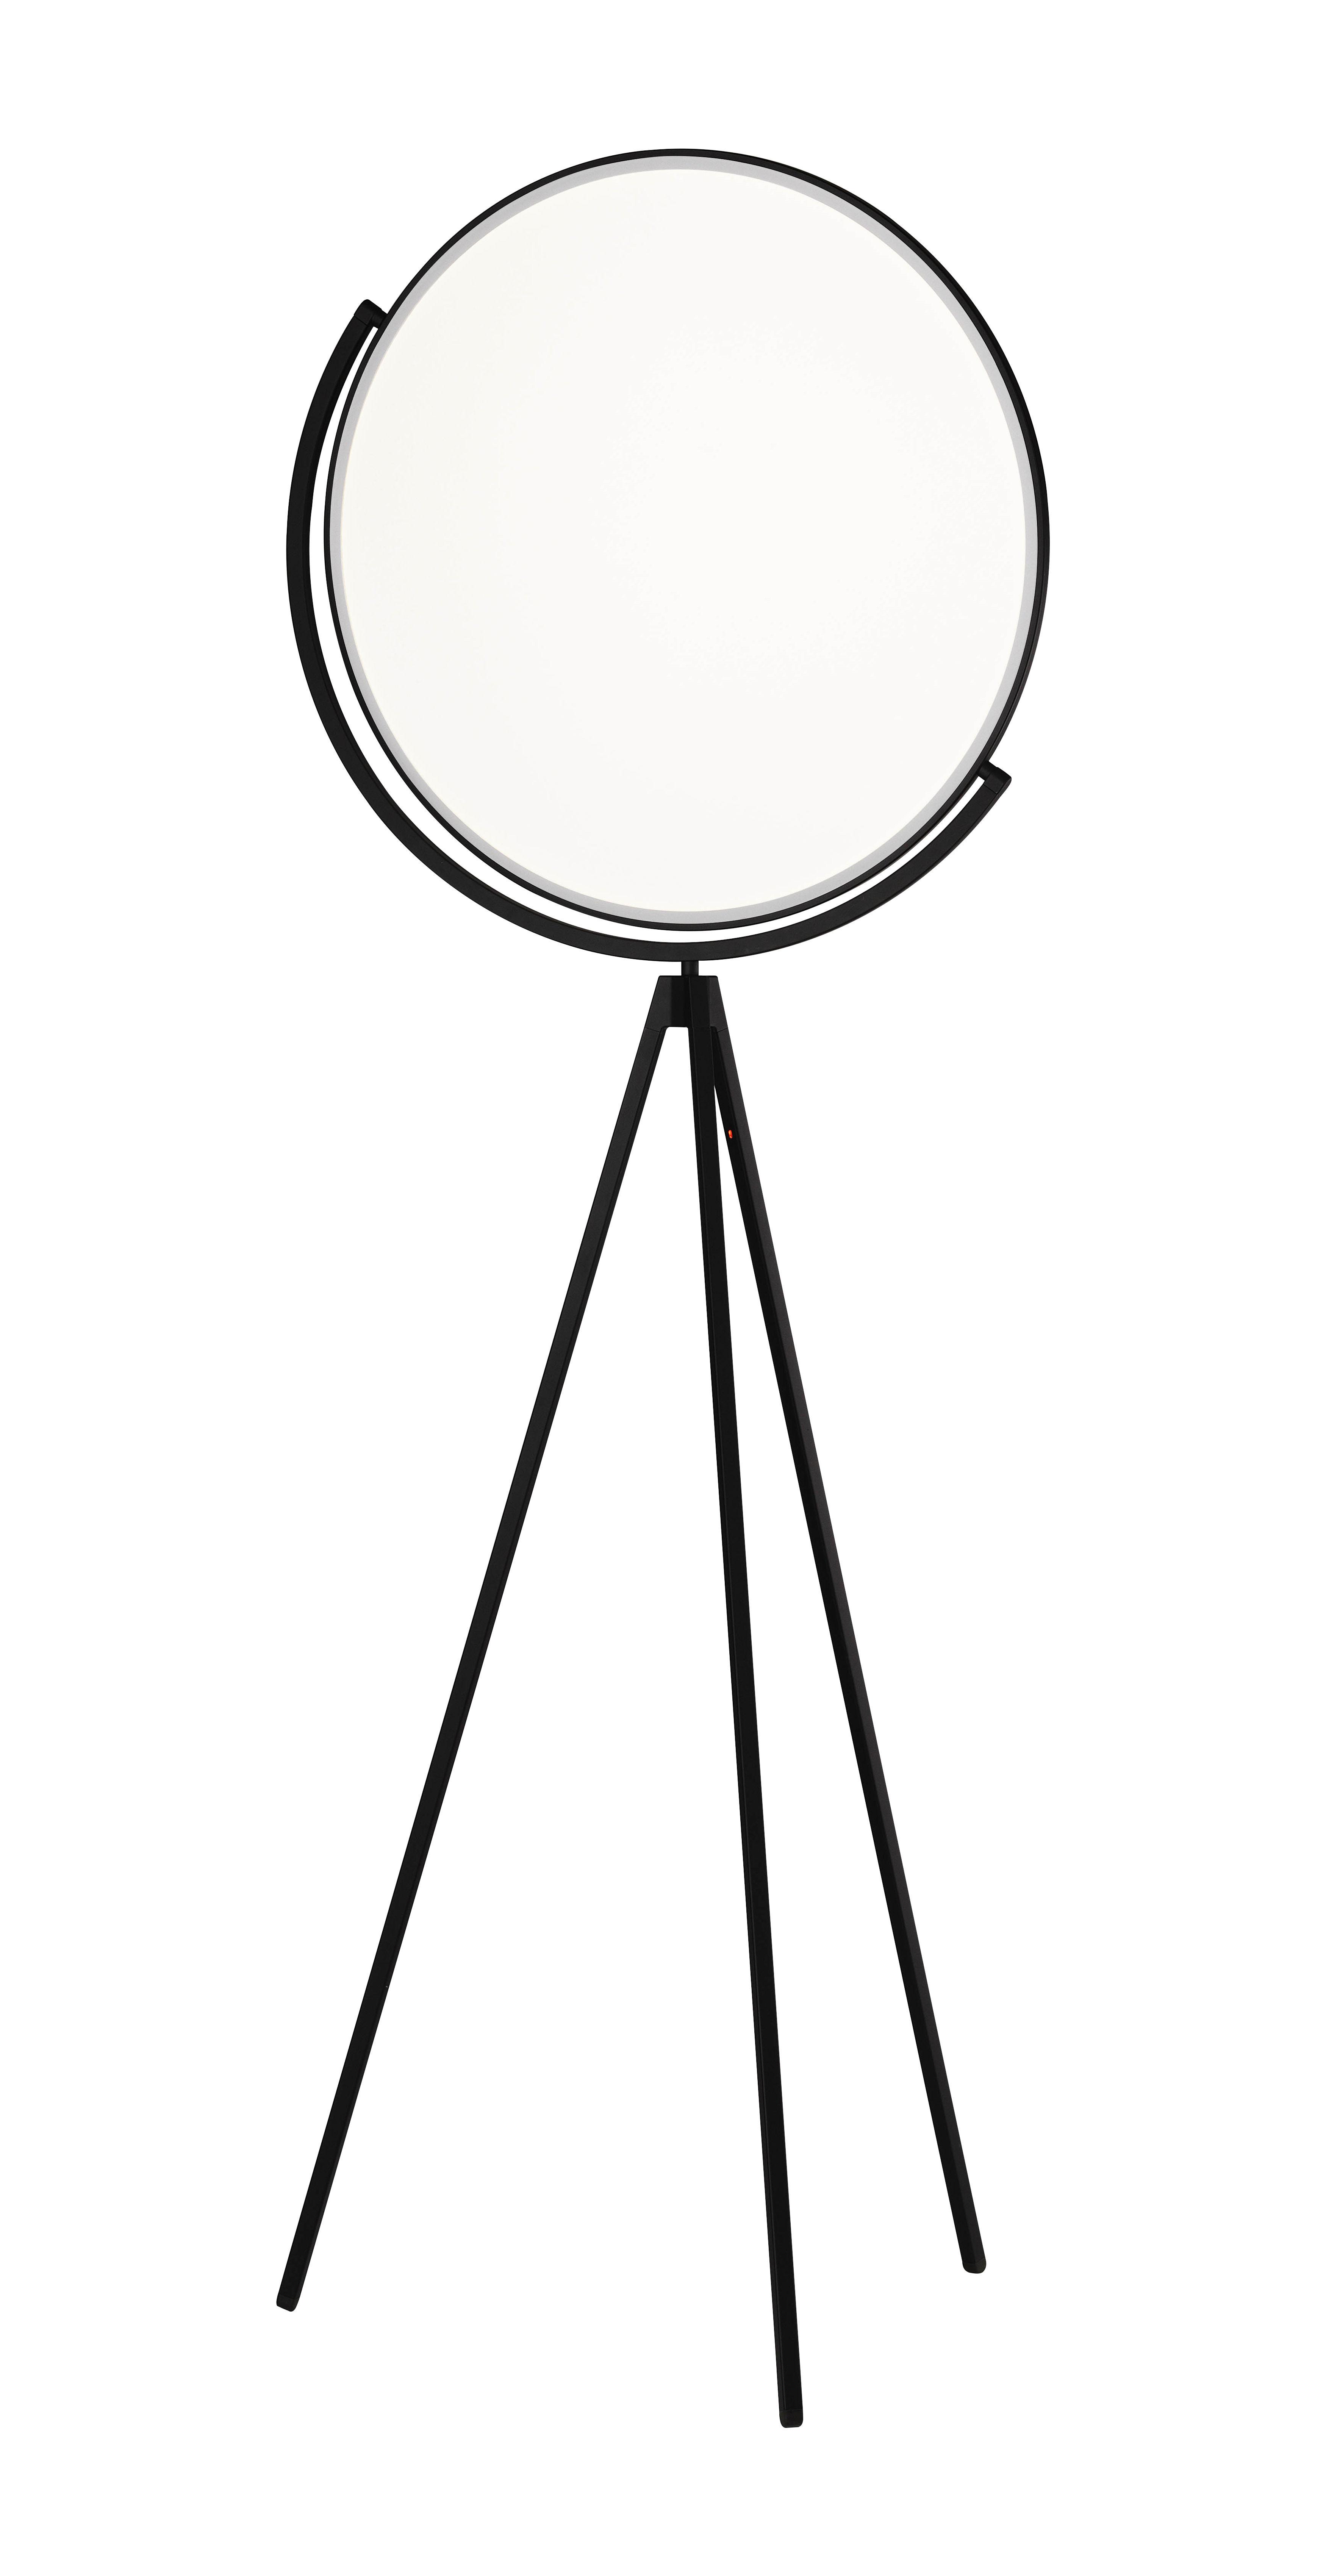 Lighting - Floor lamps - Superloon LED Floor lamp - H 197 cm by Flos - black - Painted aluminium, PMMA